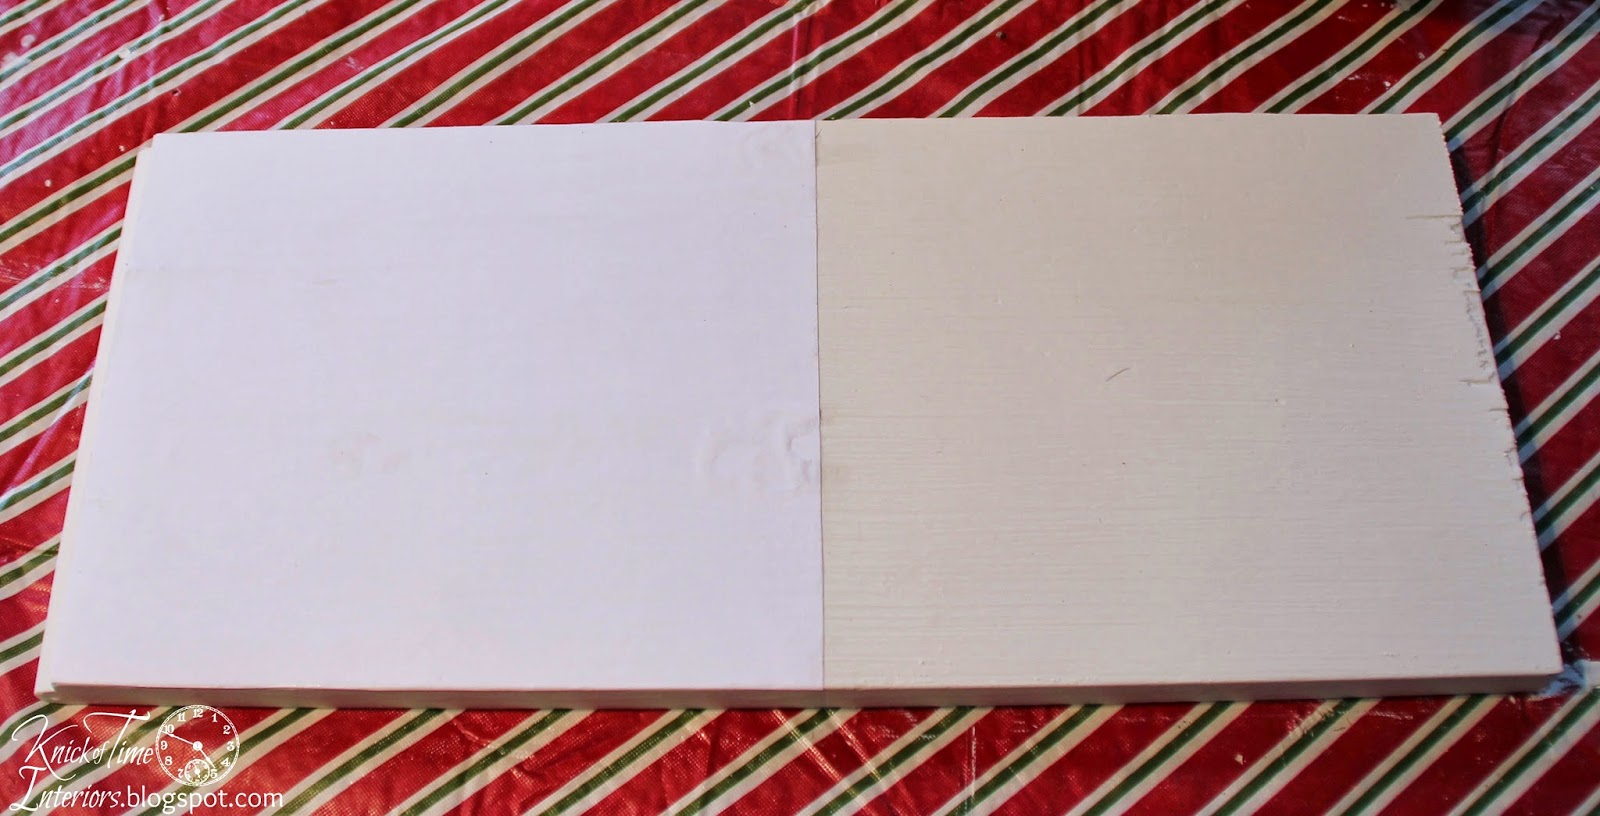 Photo Transfer onto Wood with Omni Gel - Repurposed Wood Salvage Coat Rack via Knick of Time